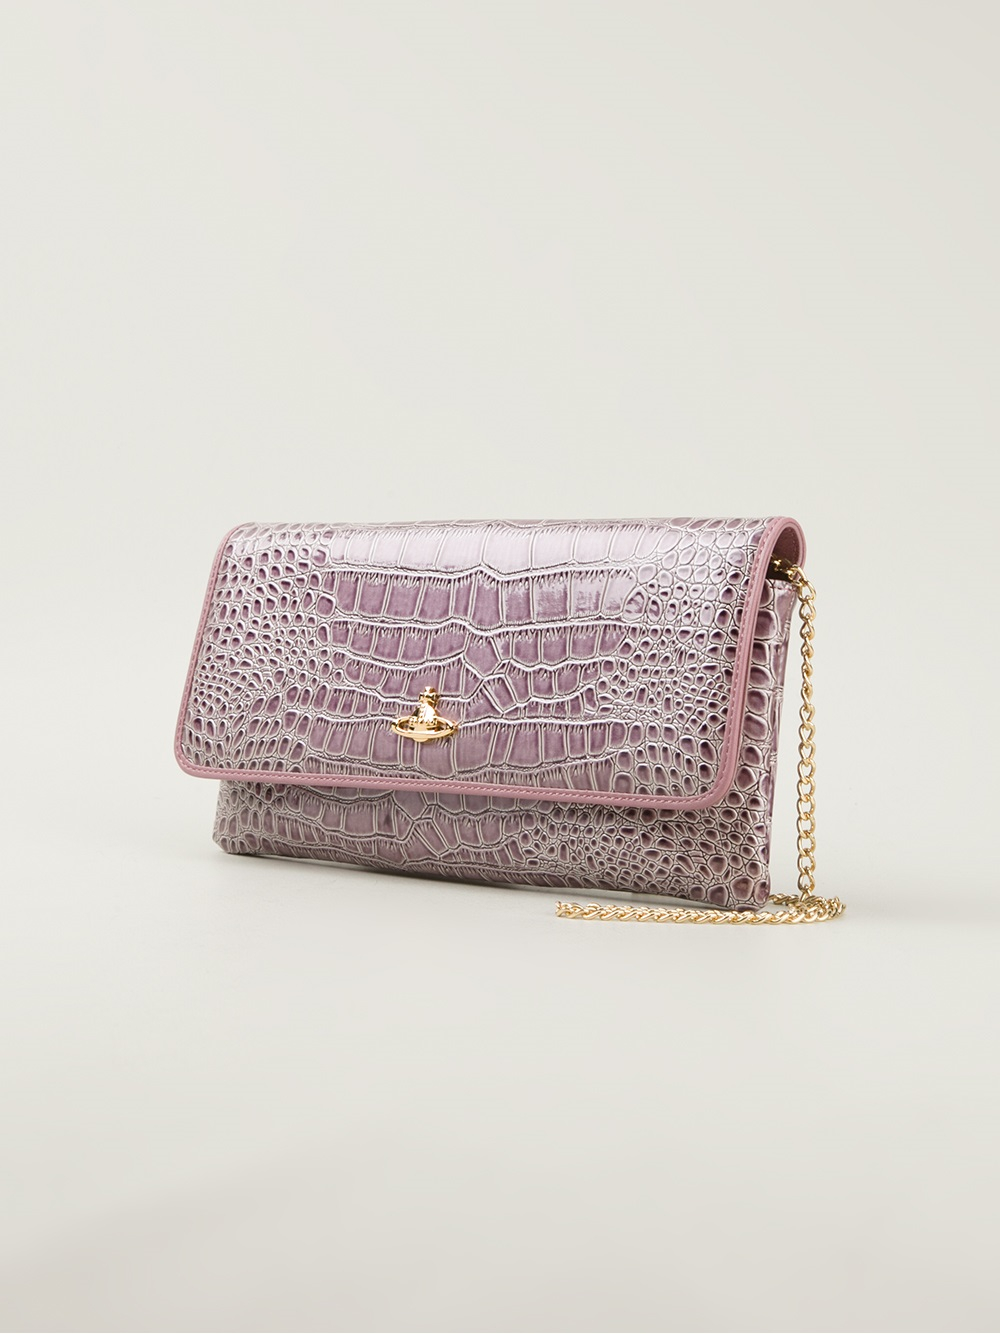 a32db628404d8 Lyst - Vivienne Westwood Chancery Clutch in Pink